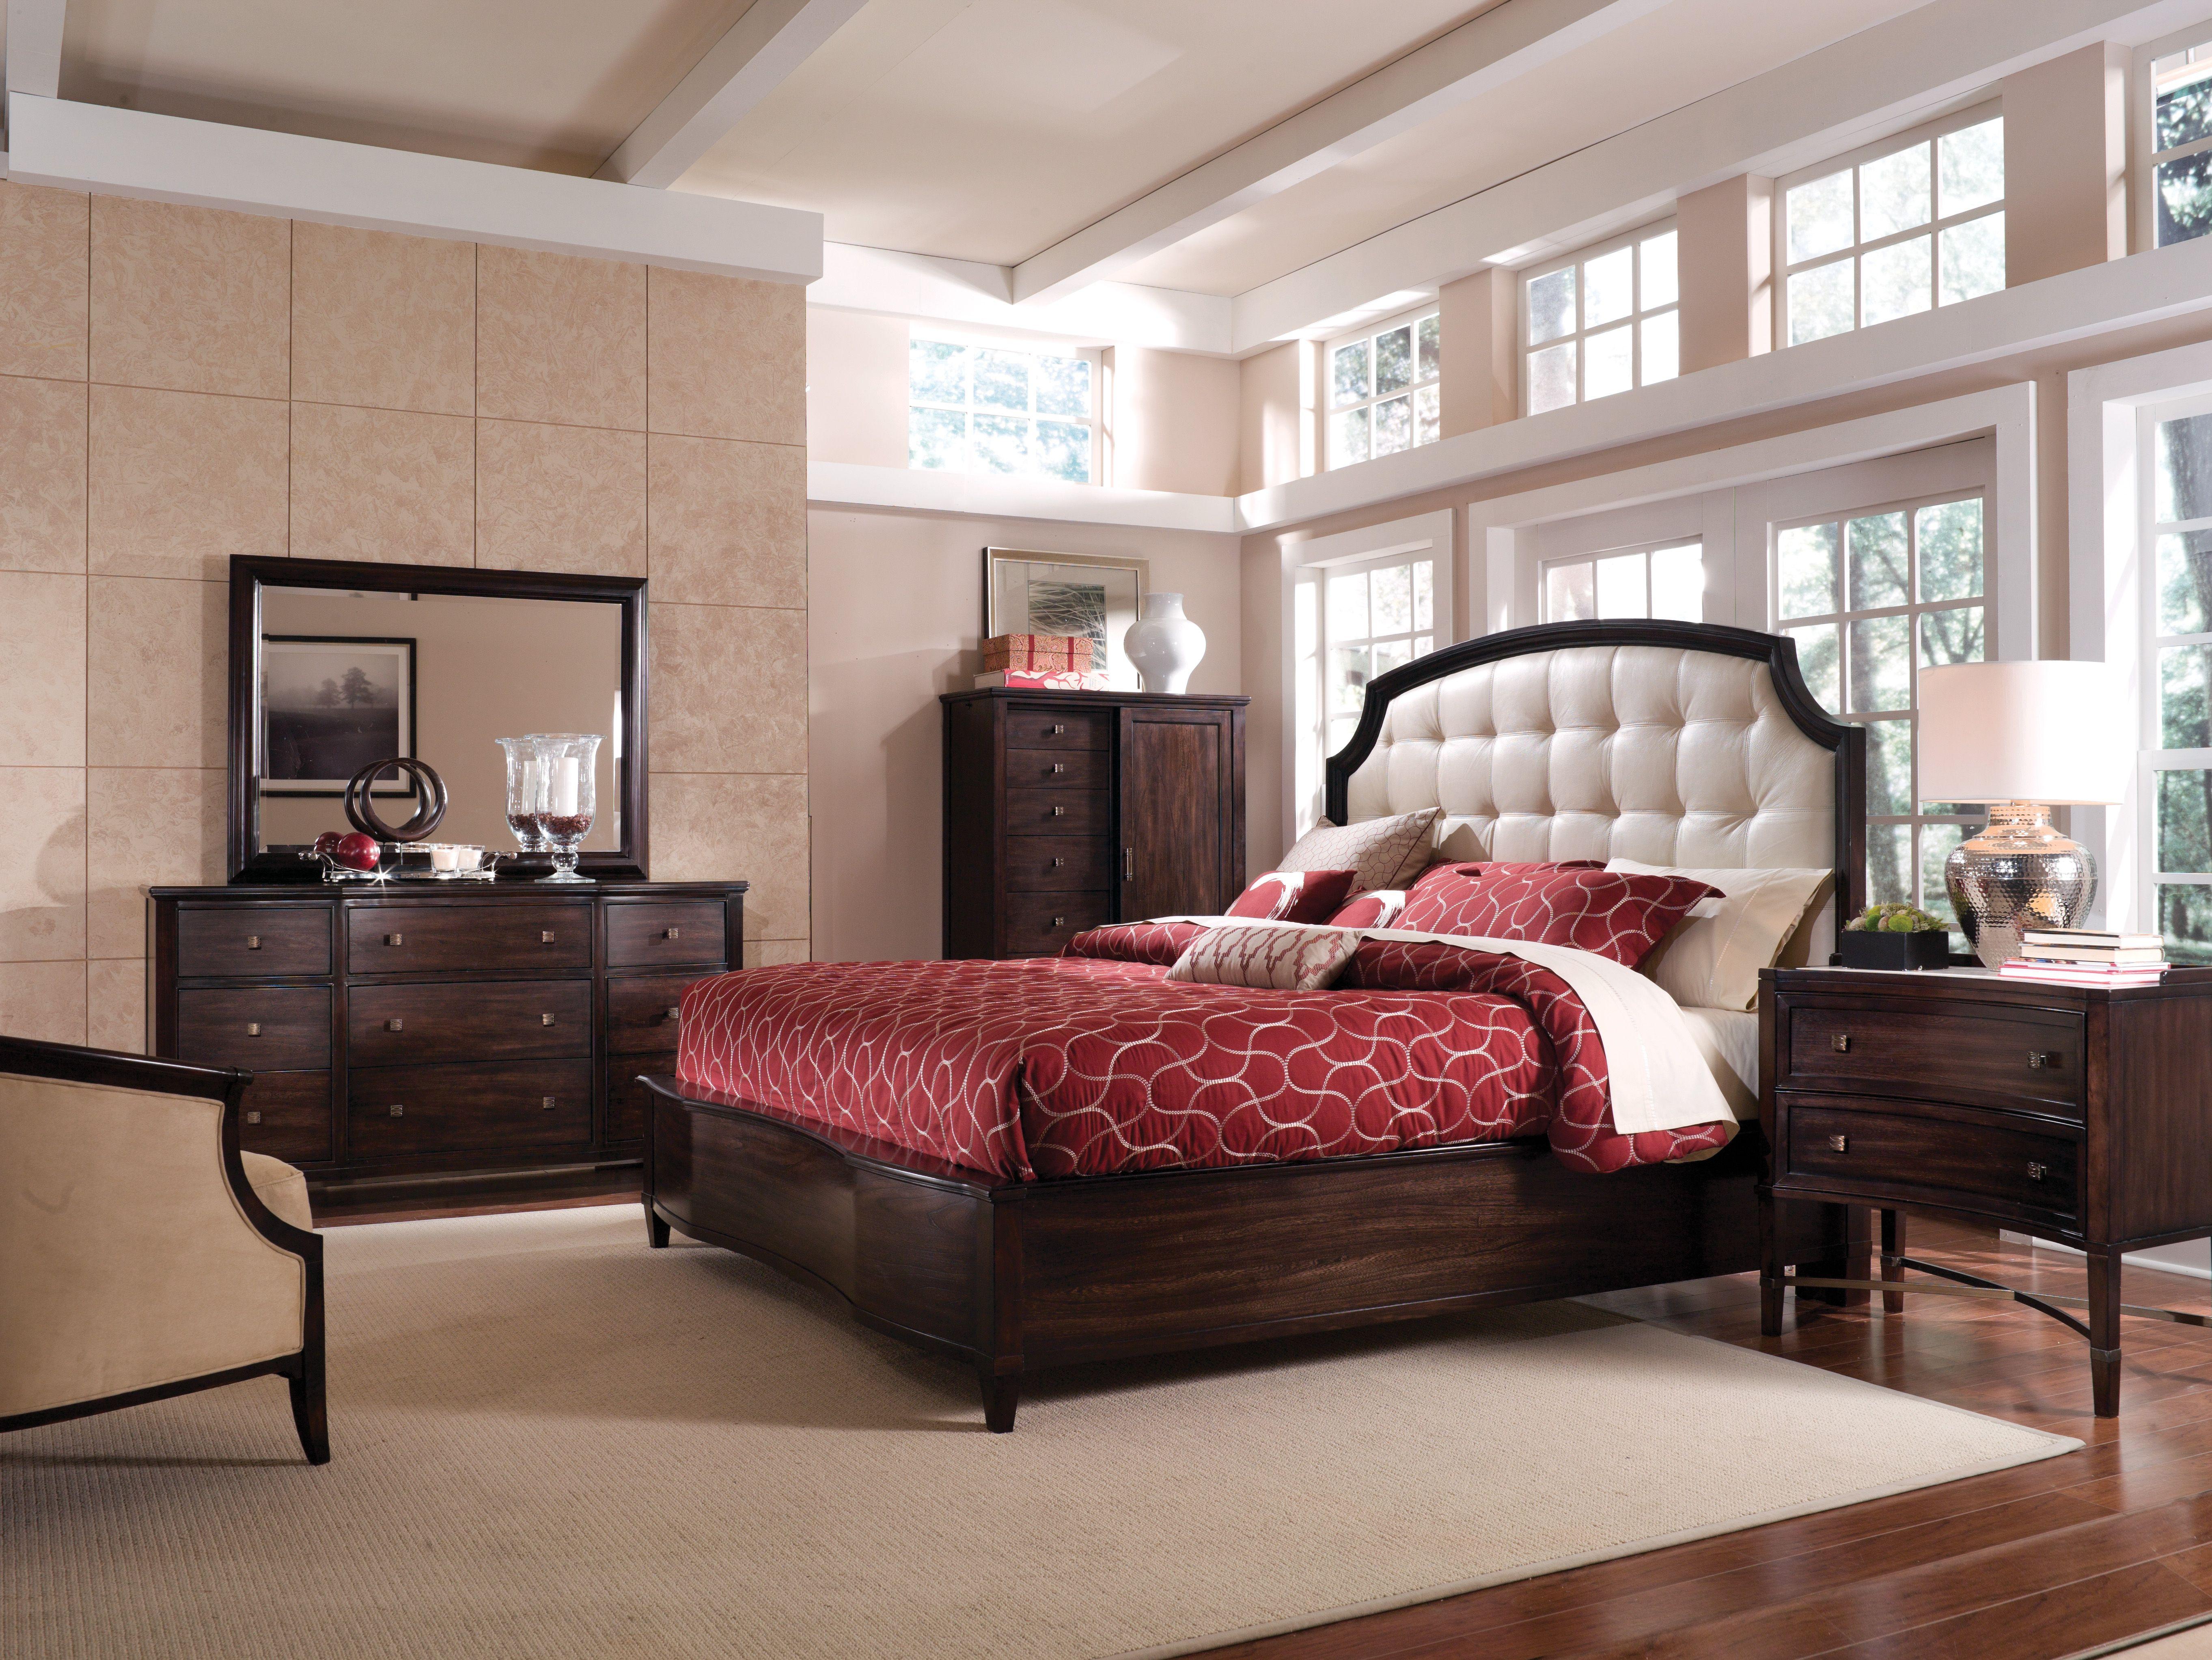 Simple And Minimalis Bed Room Design 5 Fres Homee Ideas Bedroom Set Furniture Bedroom Panel